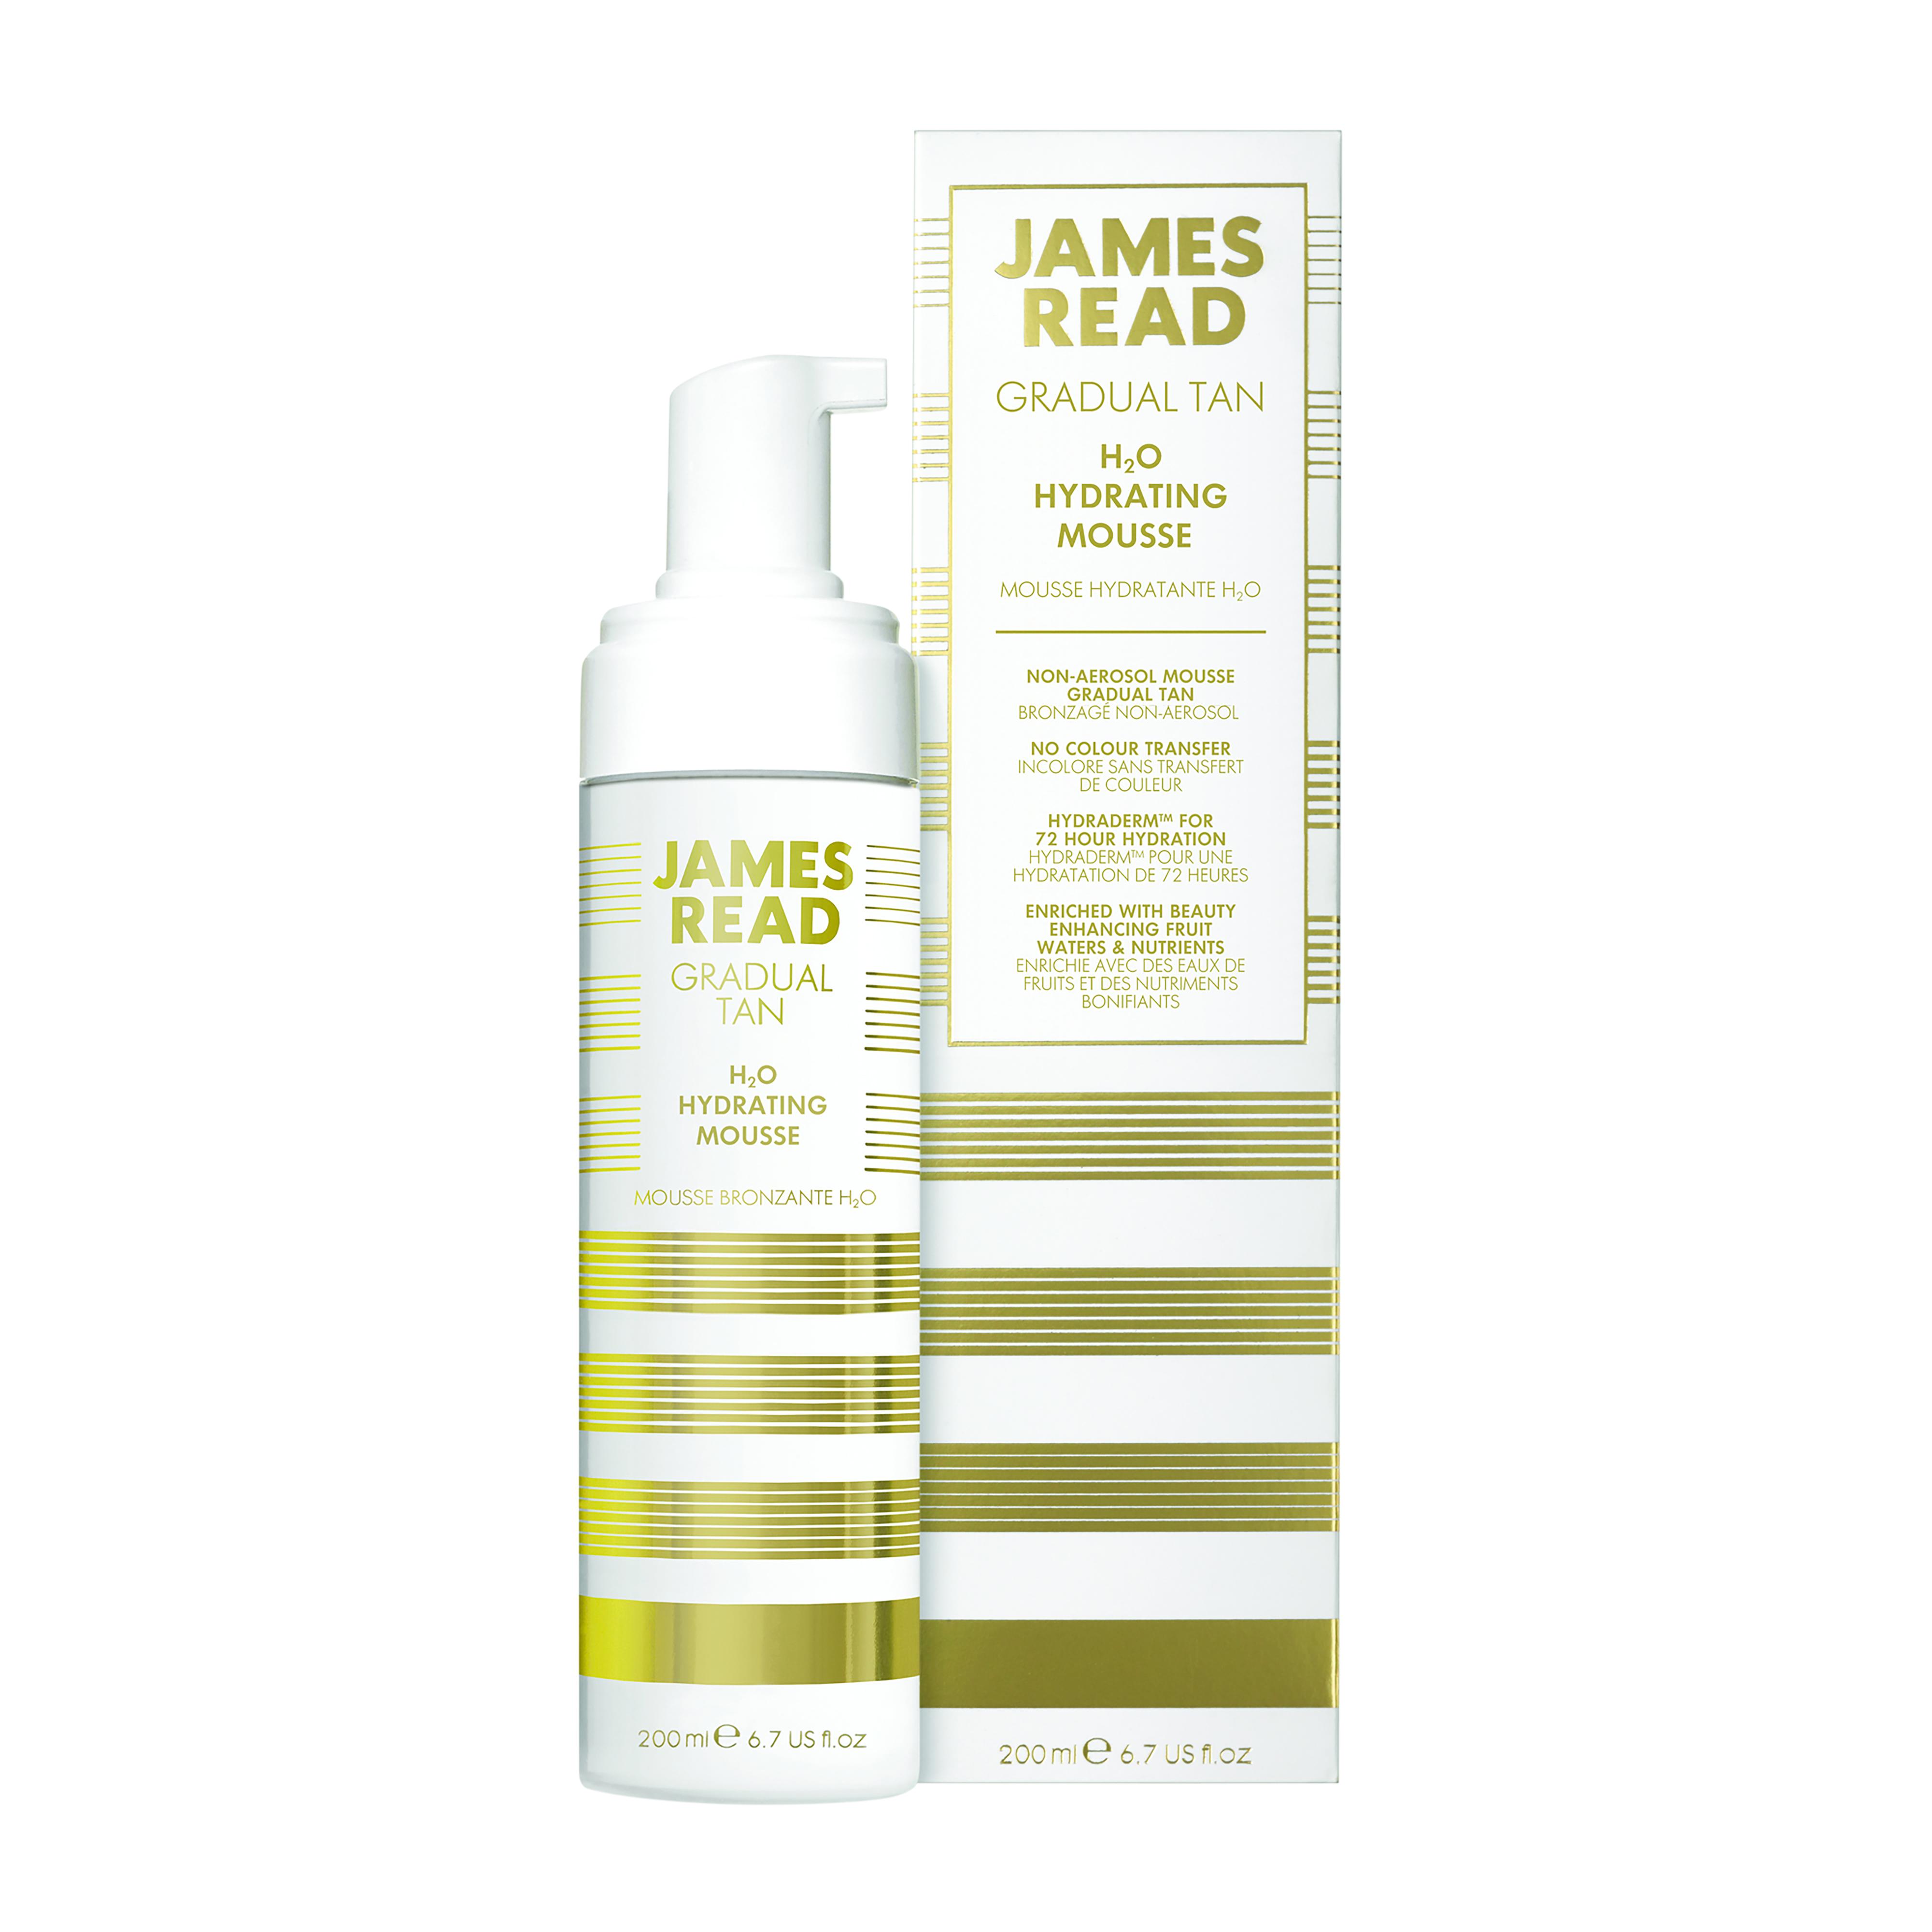 James Read Gradual Tan H2O Hydrating Mousse, 200 ml